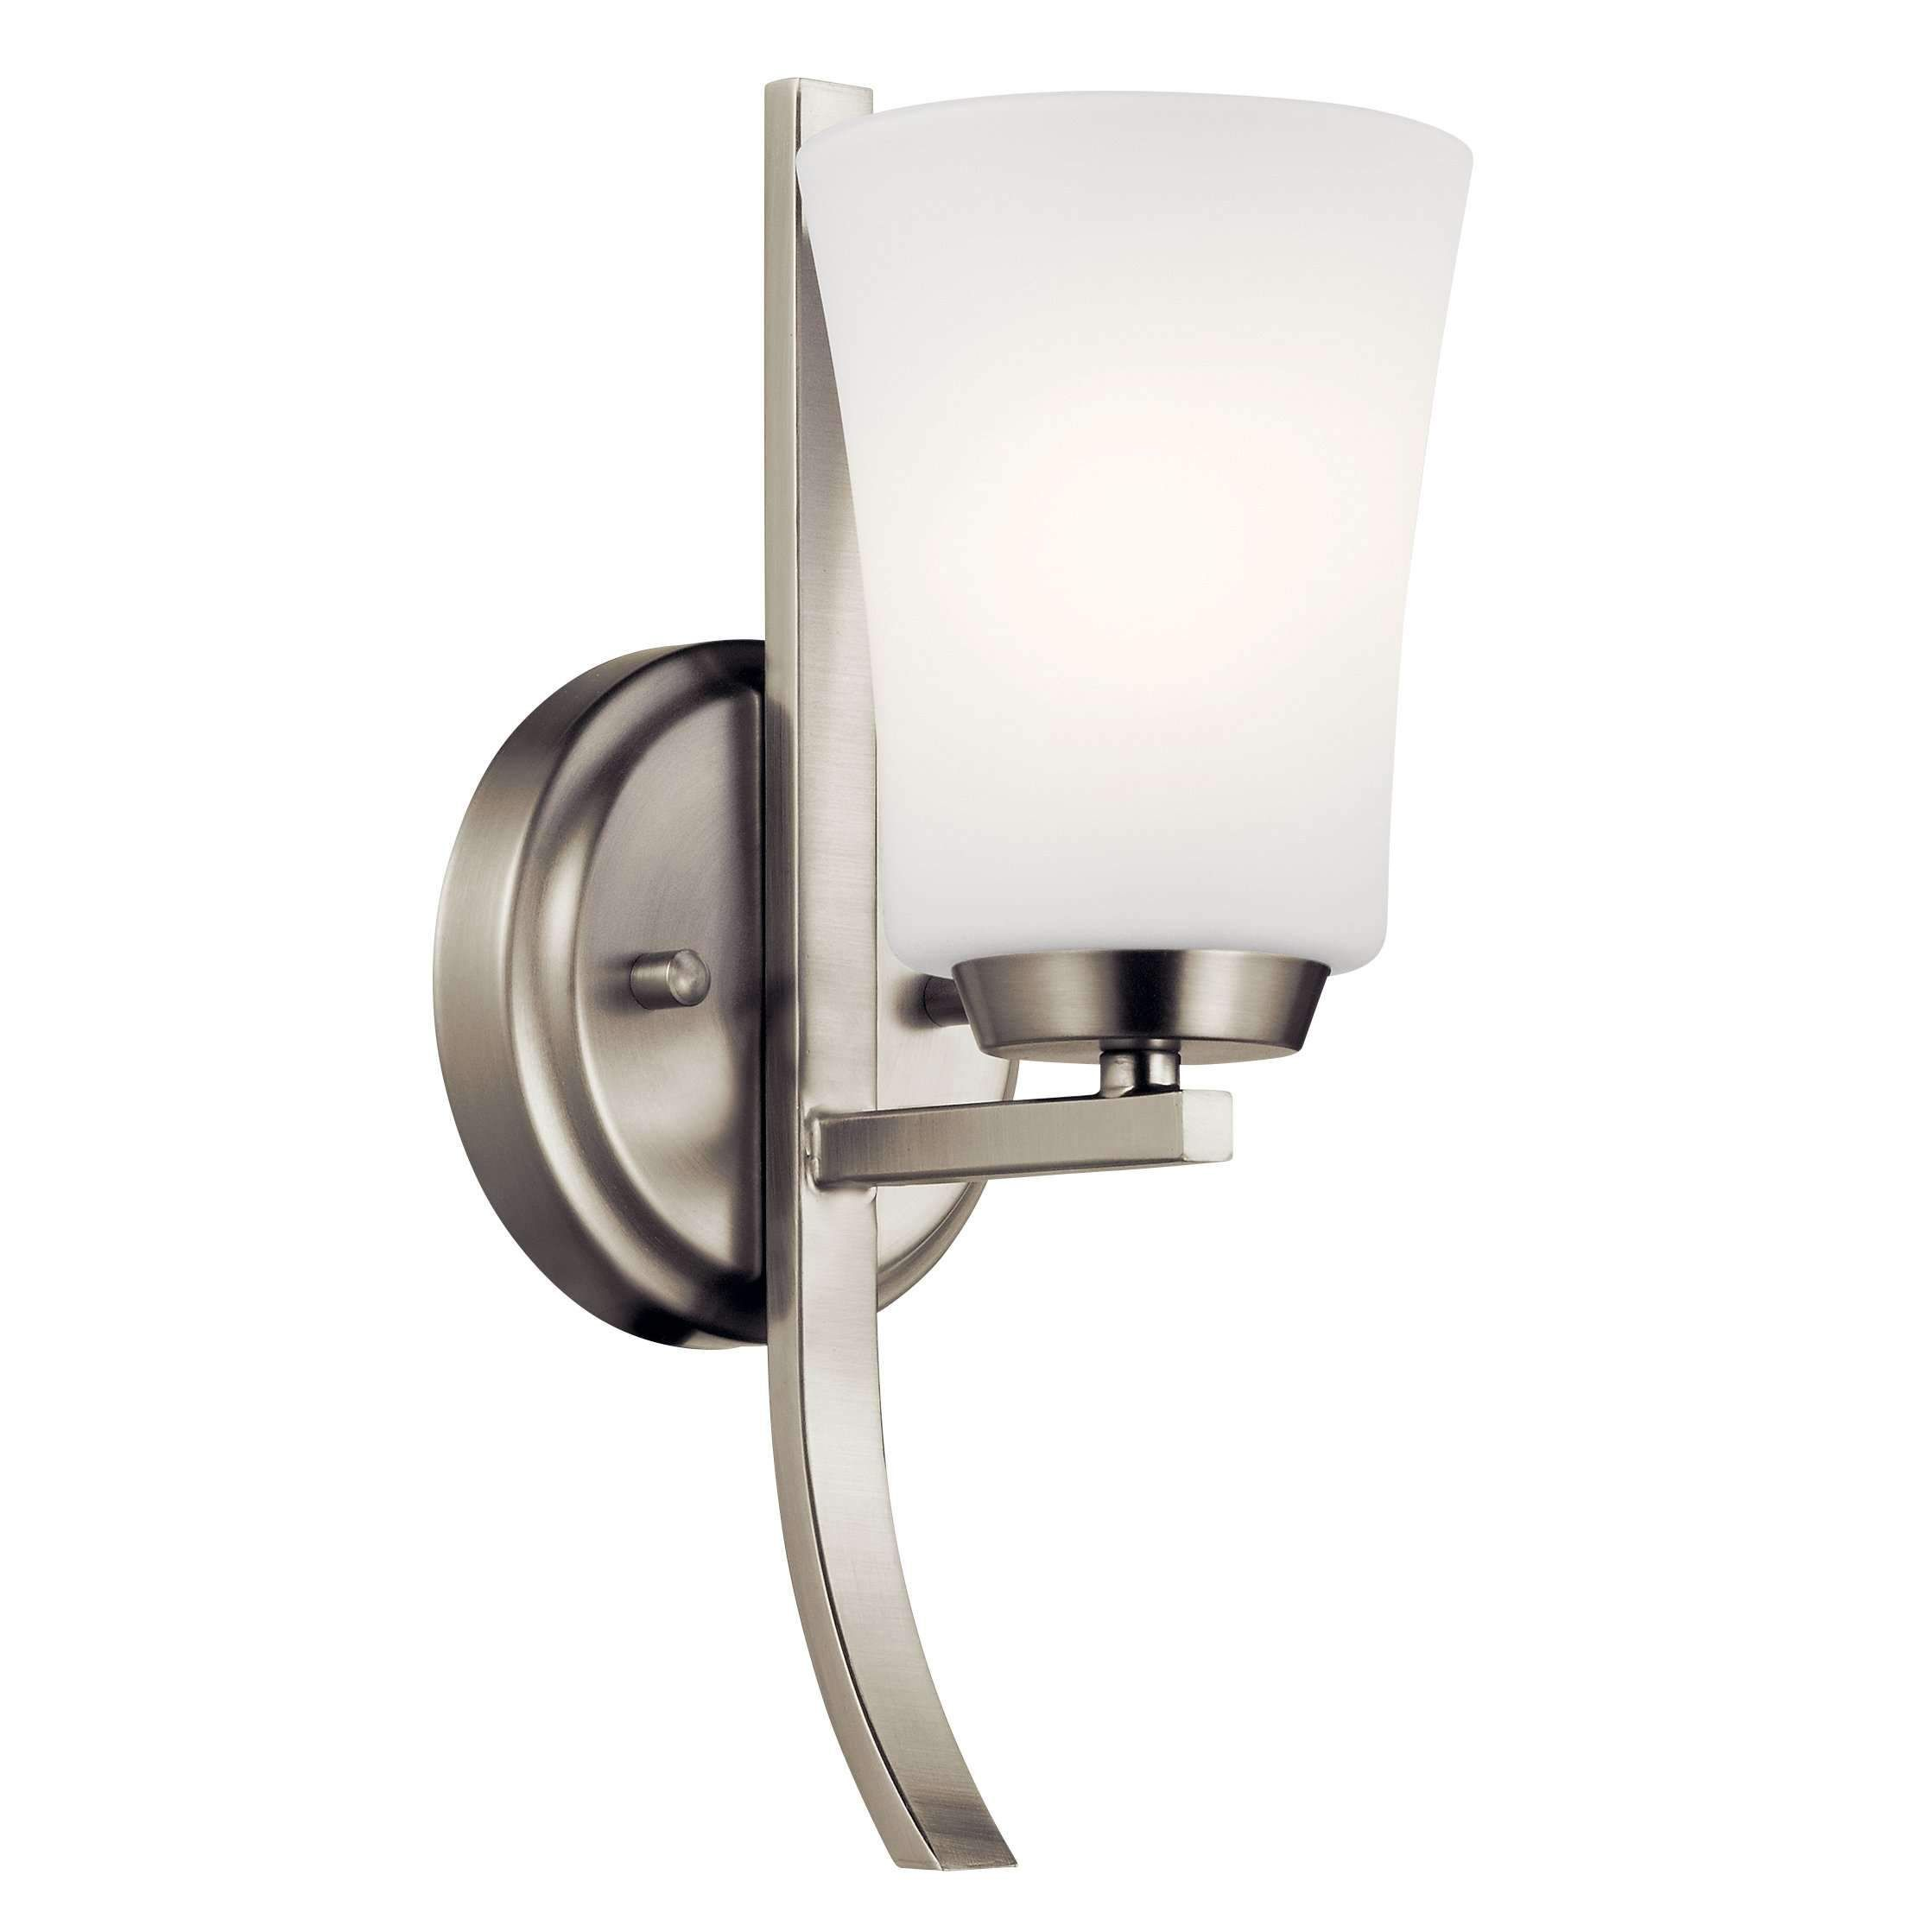 Photo of Tao wall light 1 light – brushed nickel